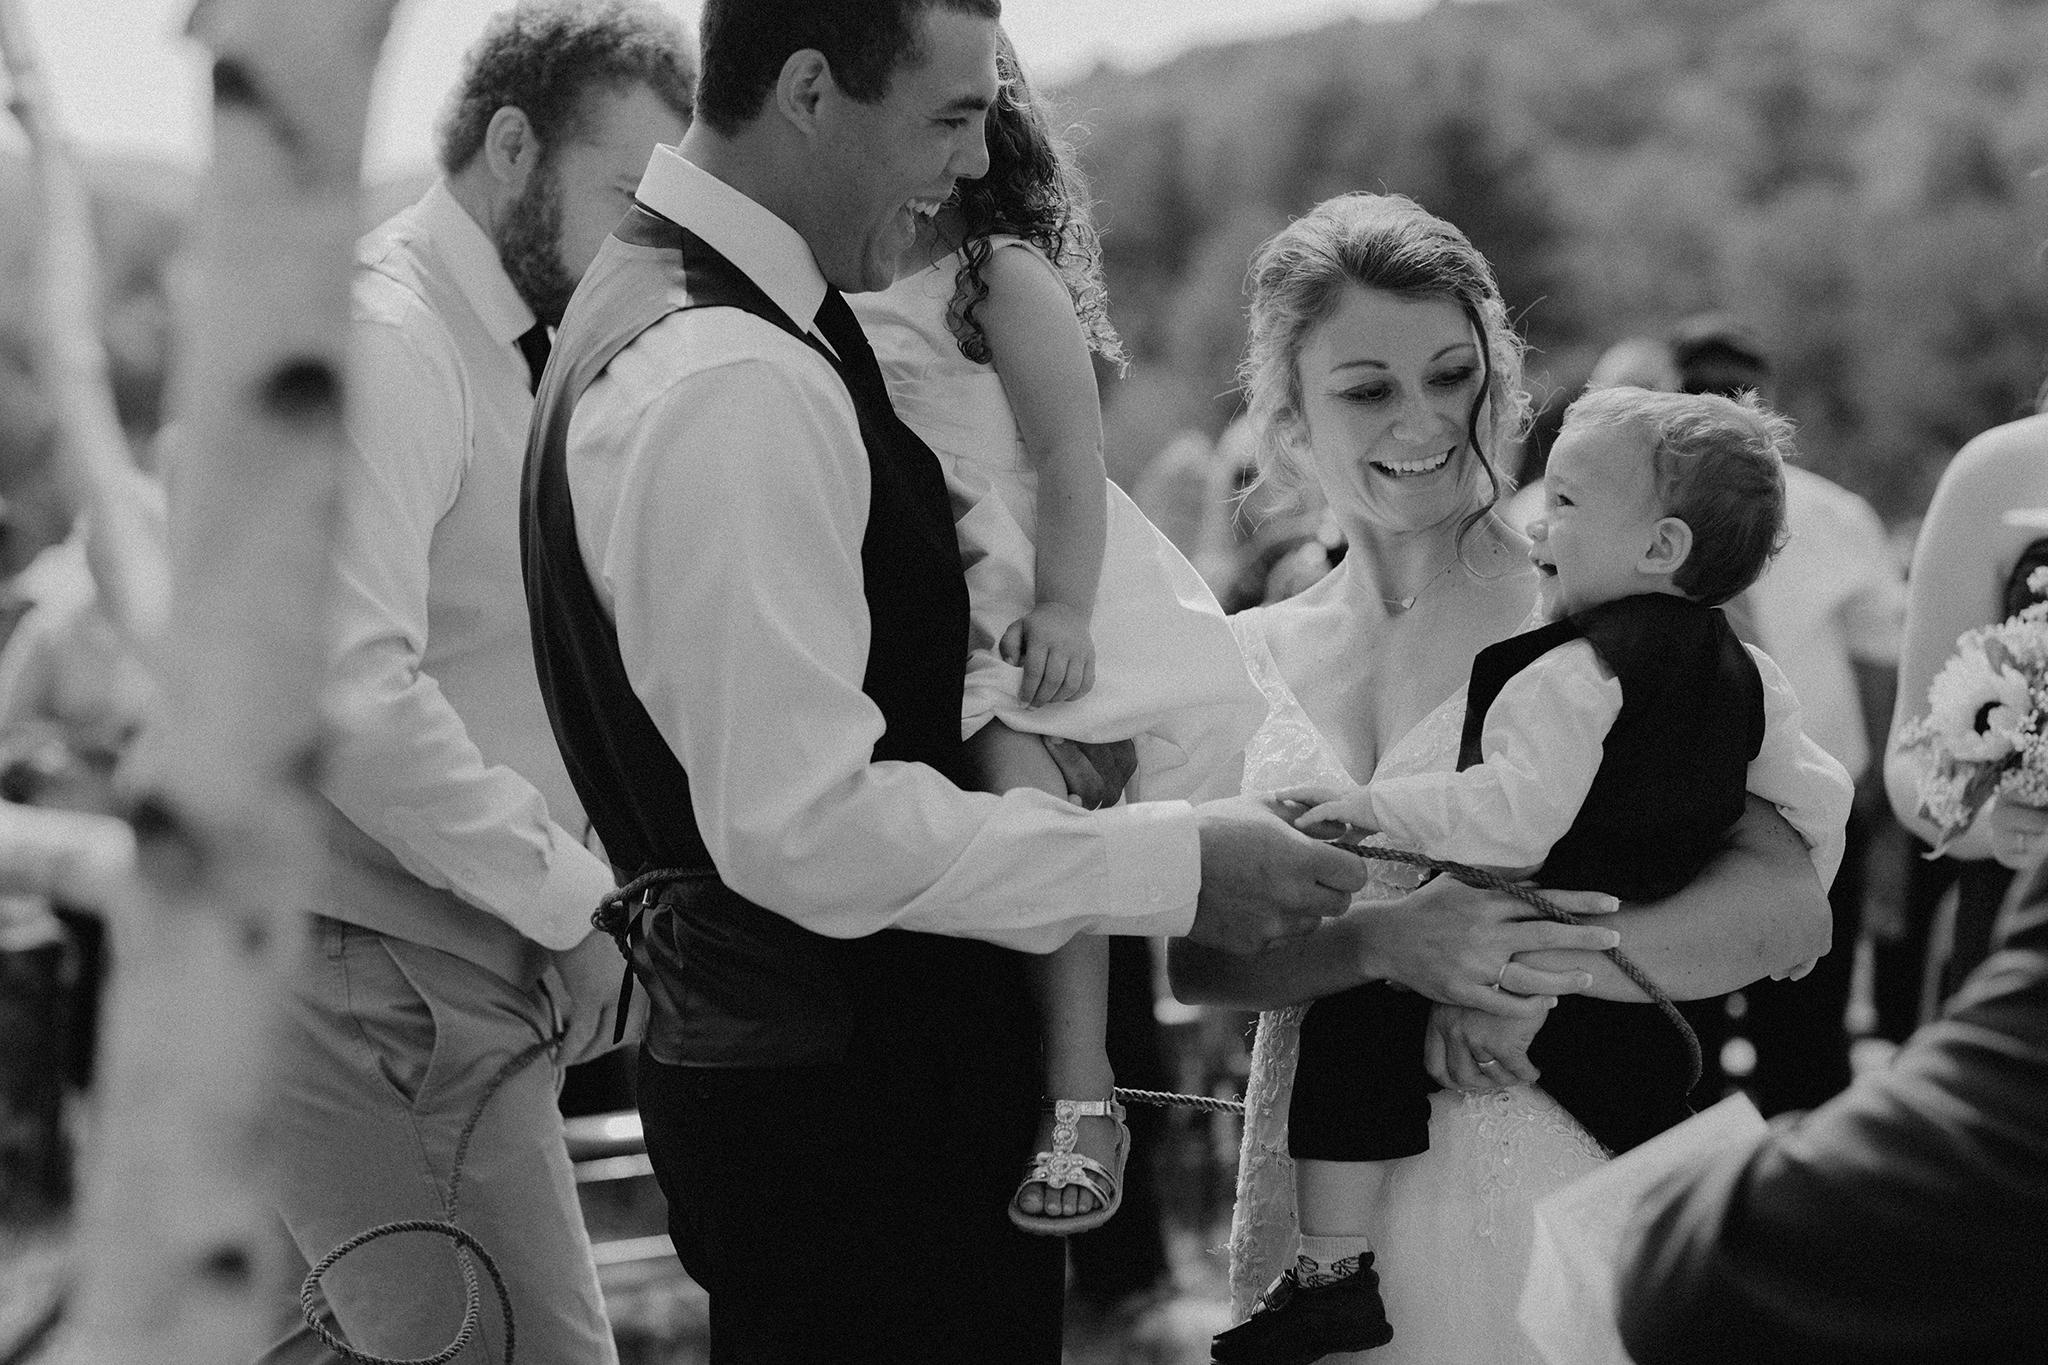 vermont-wedding-photographer-outdoor-farm-wedding-18.jpg